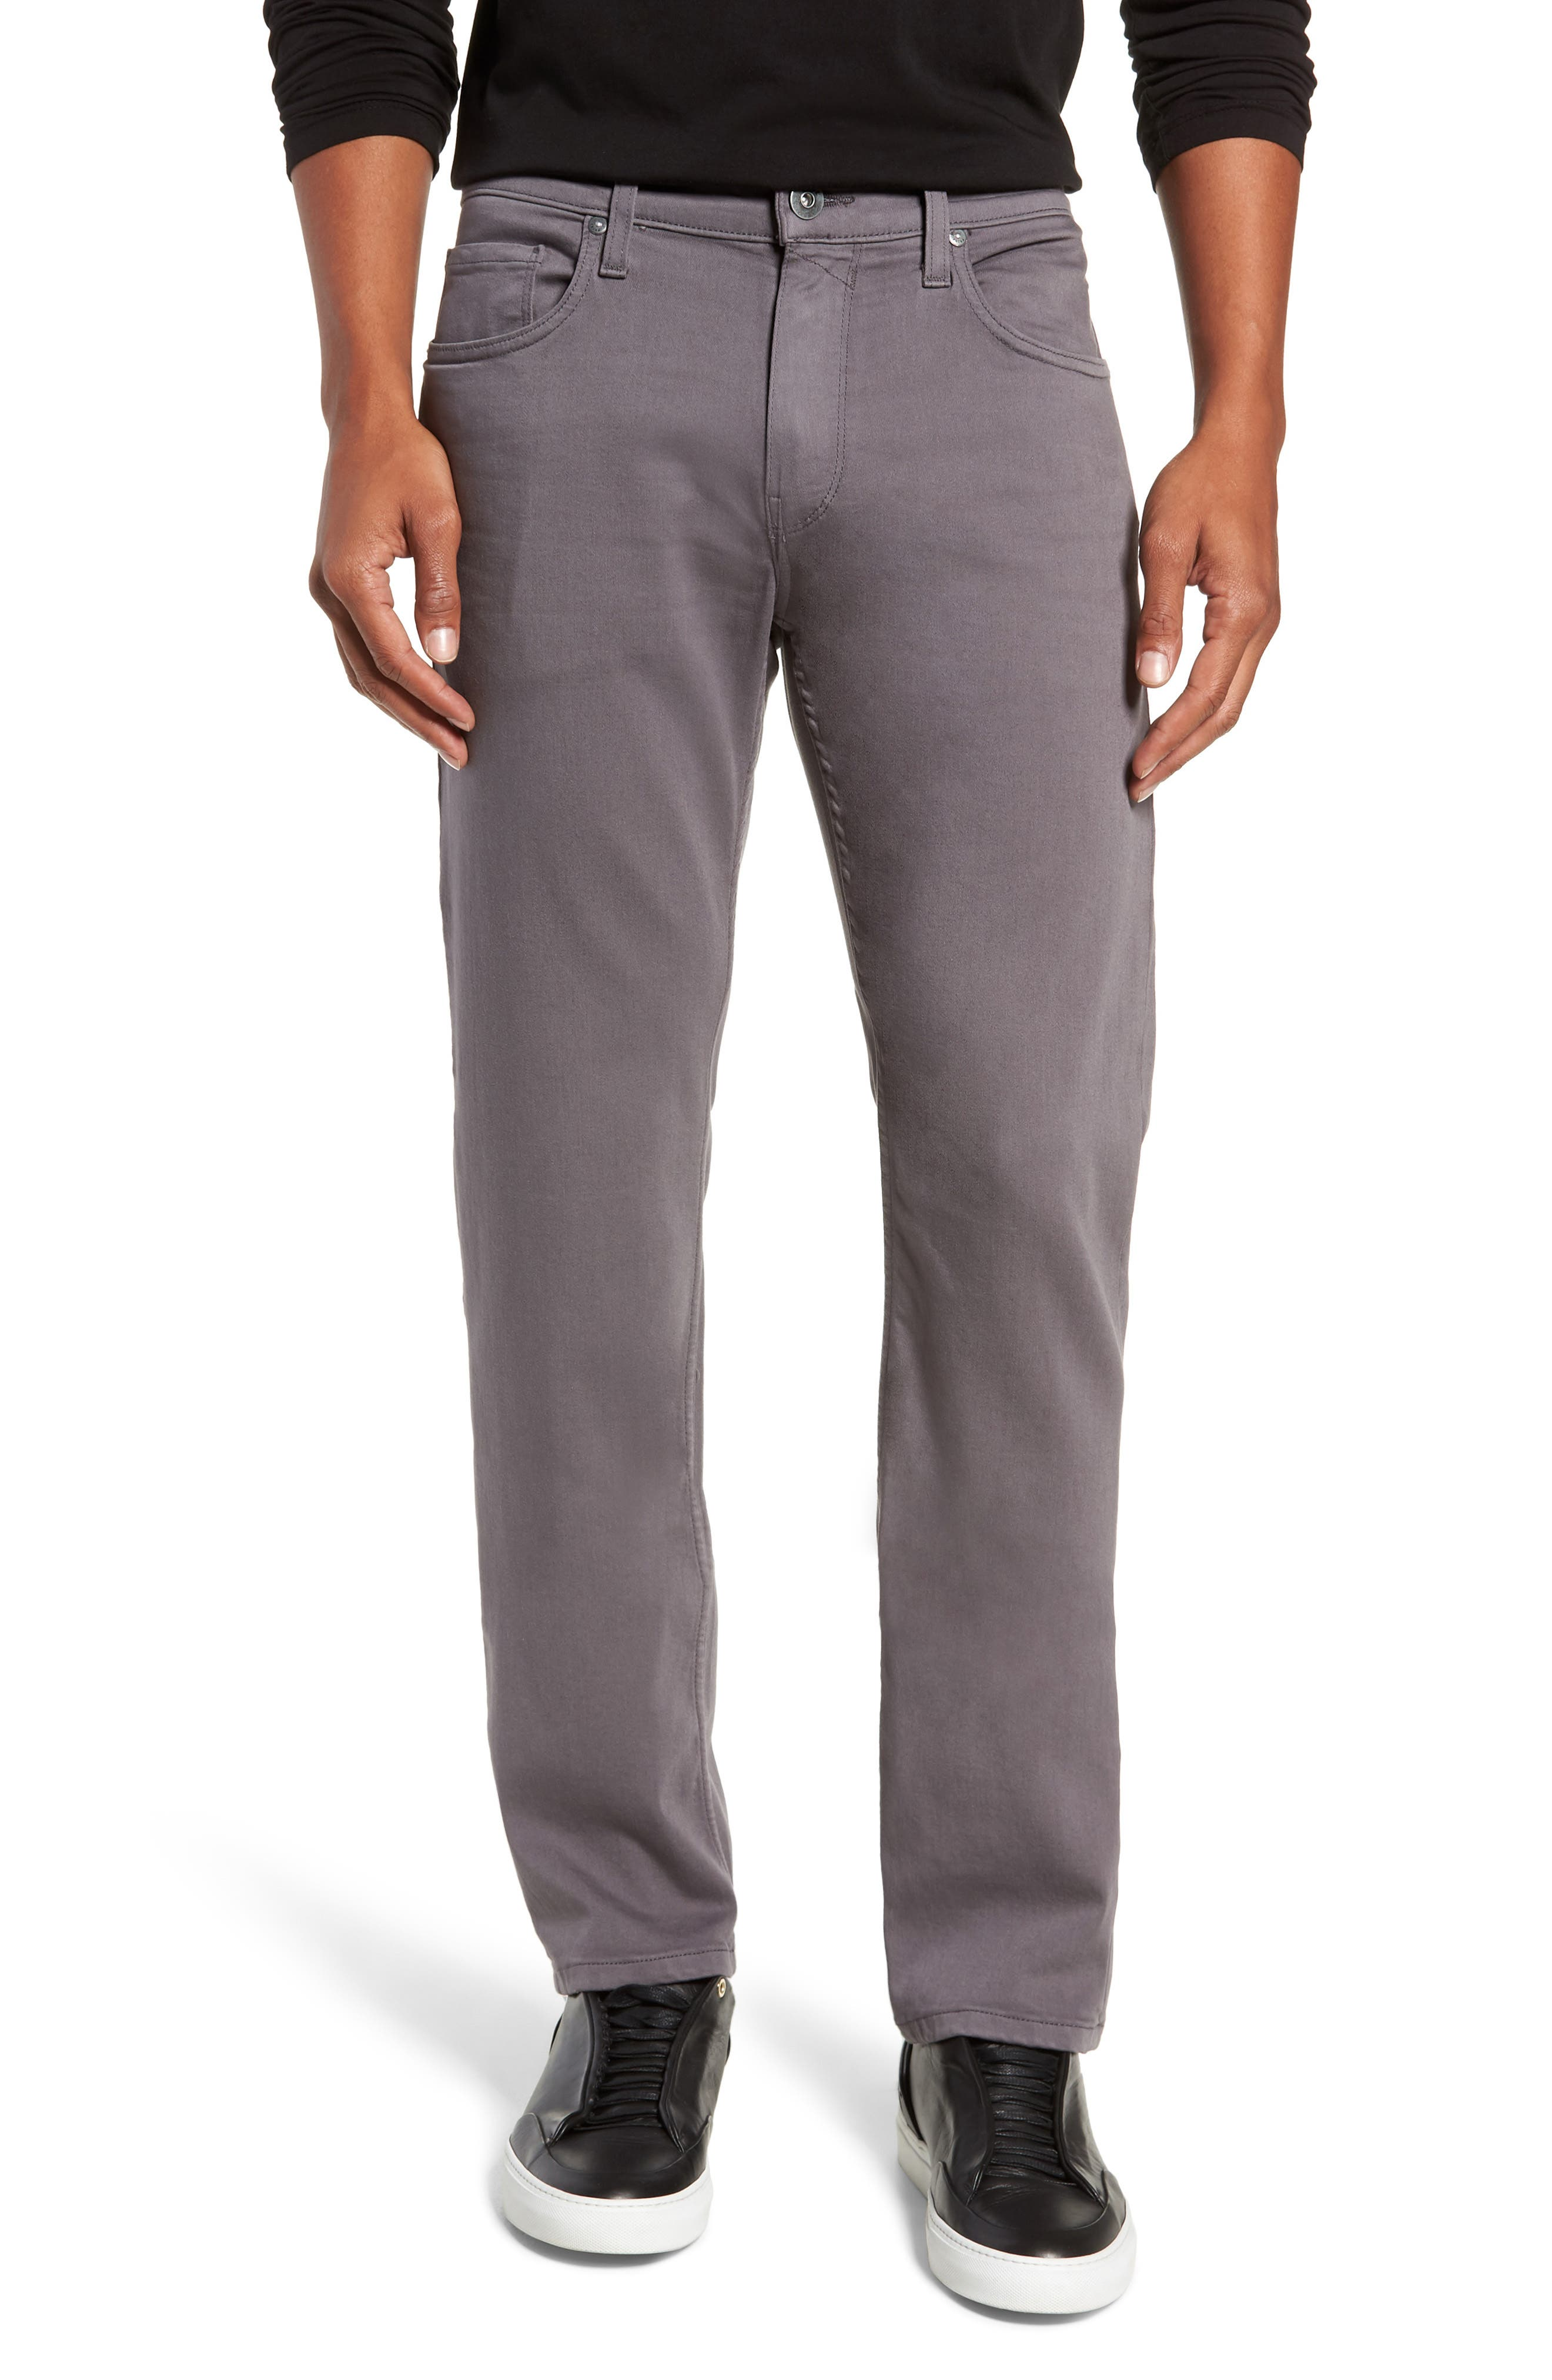 Transcend - Federal Slim Straight Leg Jeans,                         Main,                         color, 030